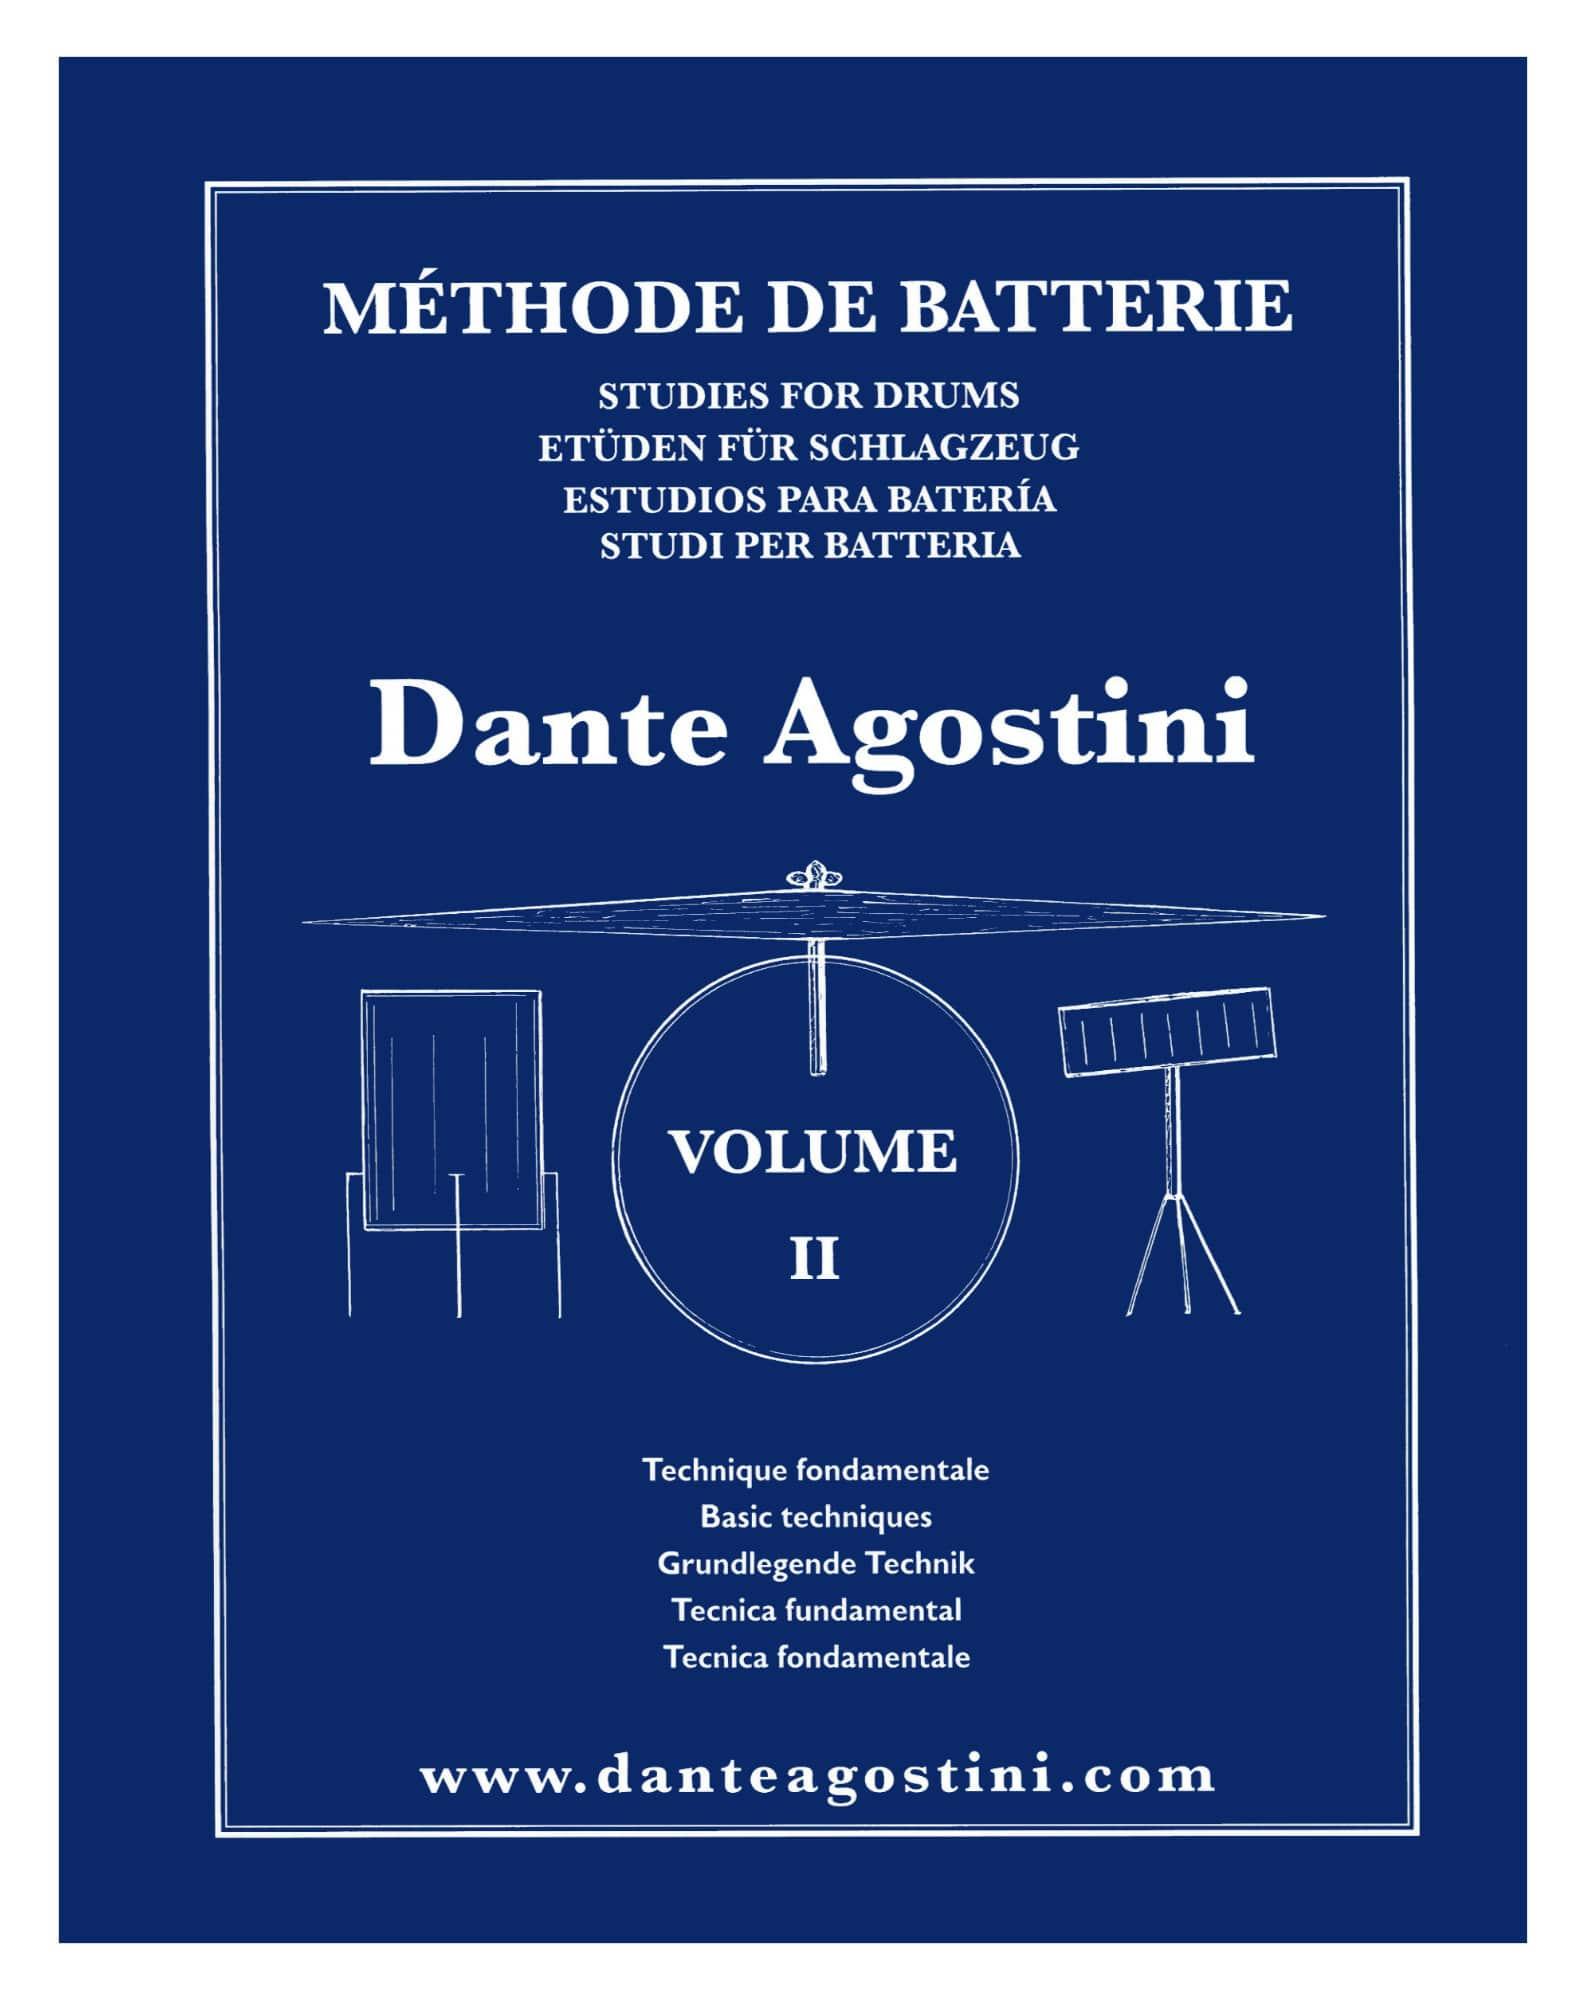 Drumslernen - Dante Agostini Méthode de Batterie Volume II - Onlineshop Musikhaus Kirstein